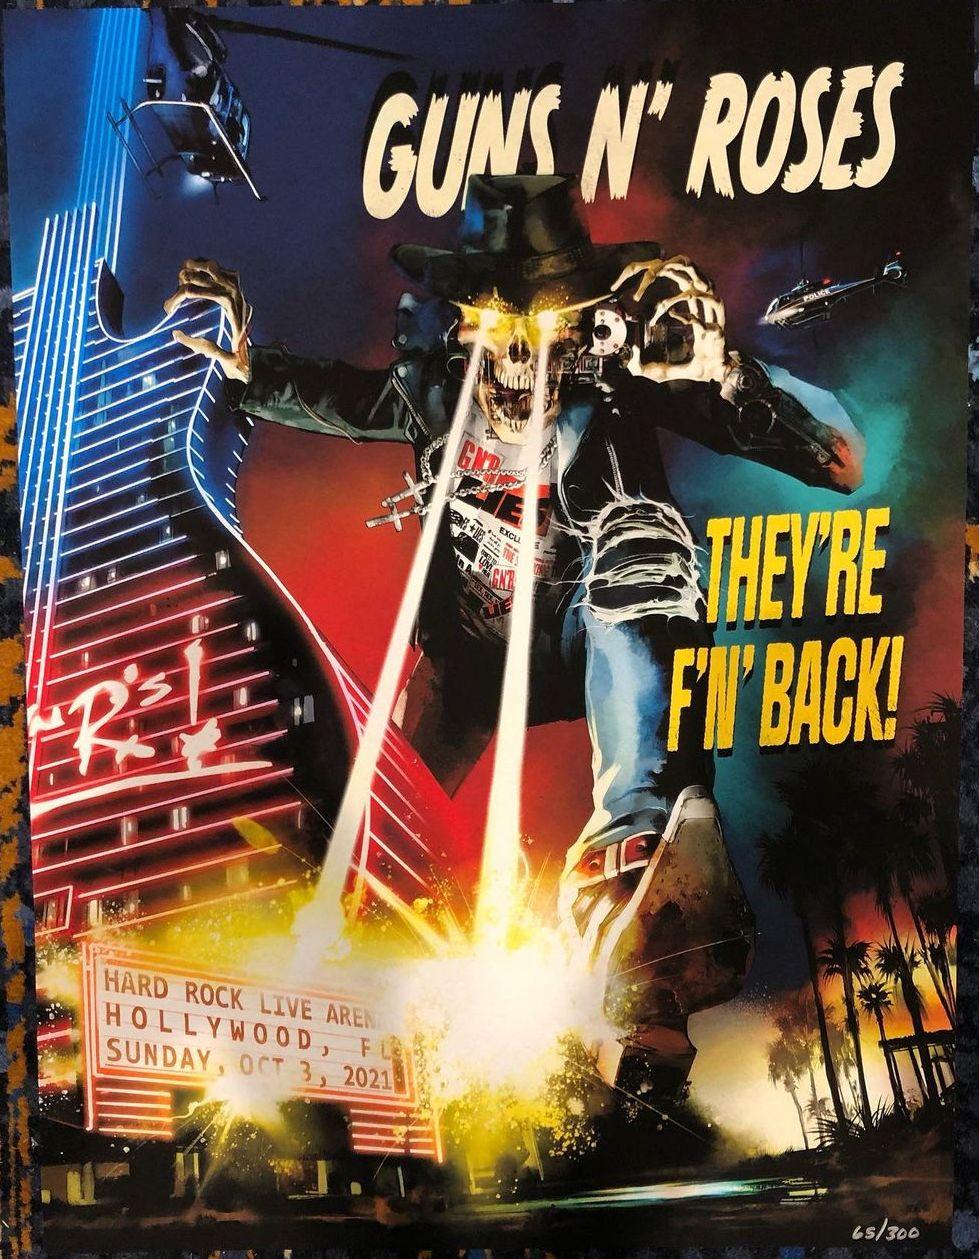 2021.10.03 - Hard Rock Live Arena, Hollywood, FL, USA. 2021_111